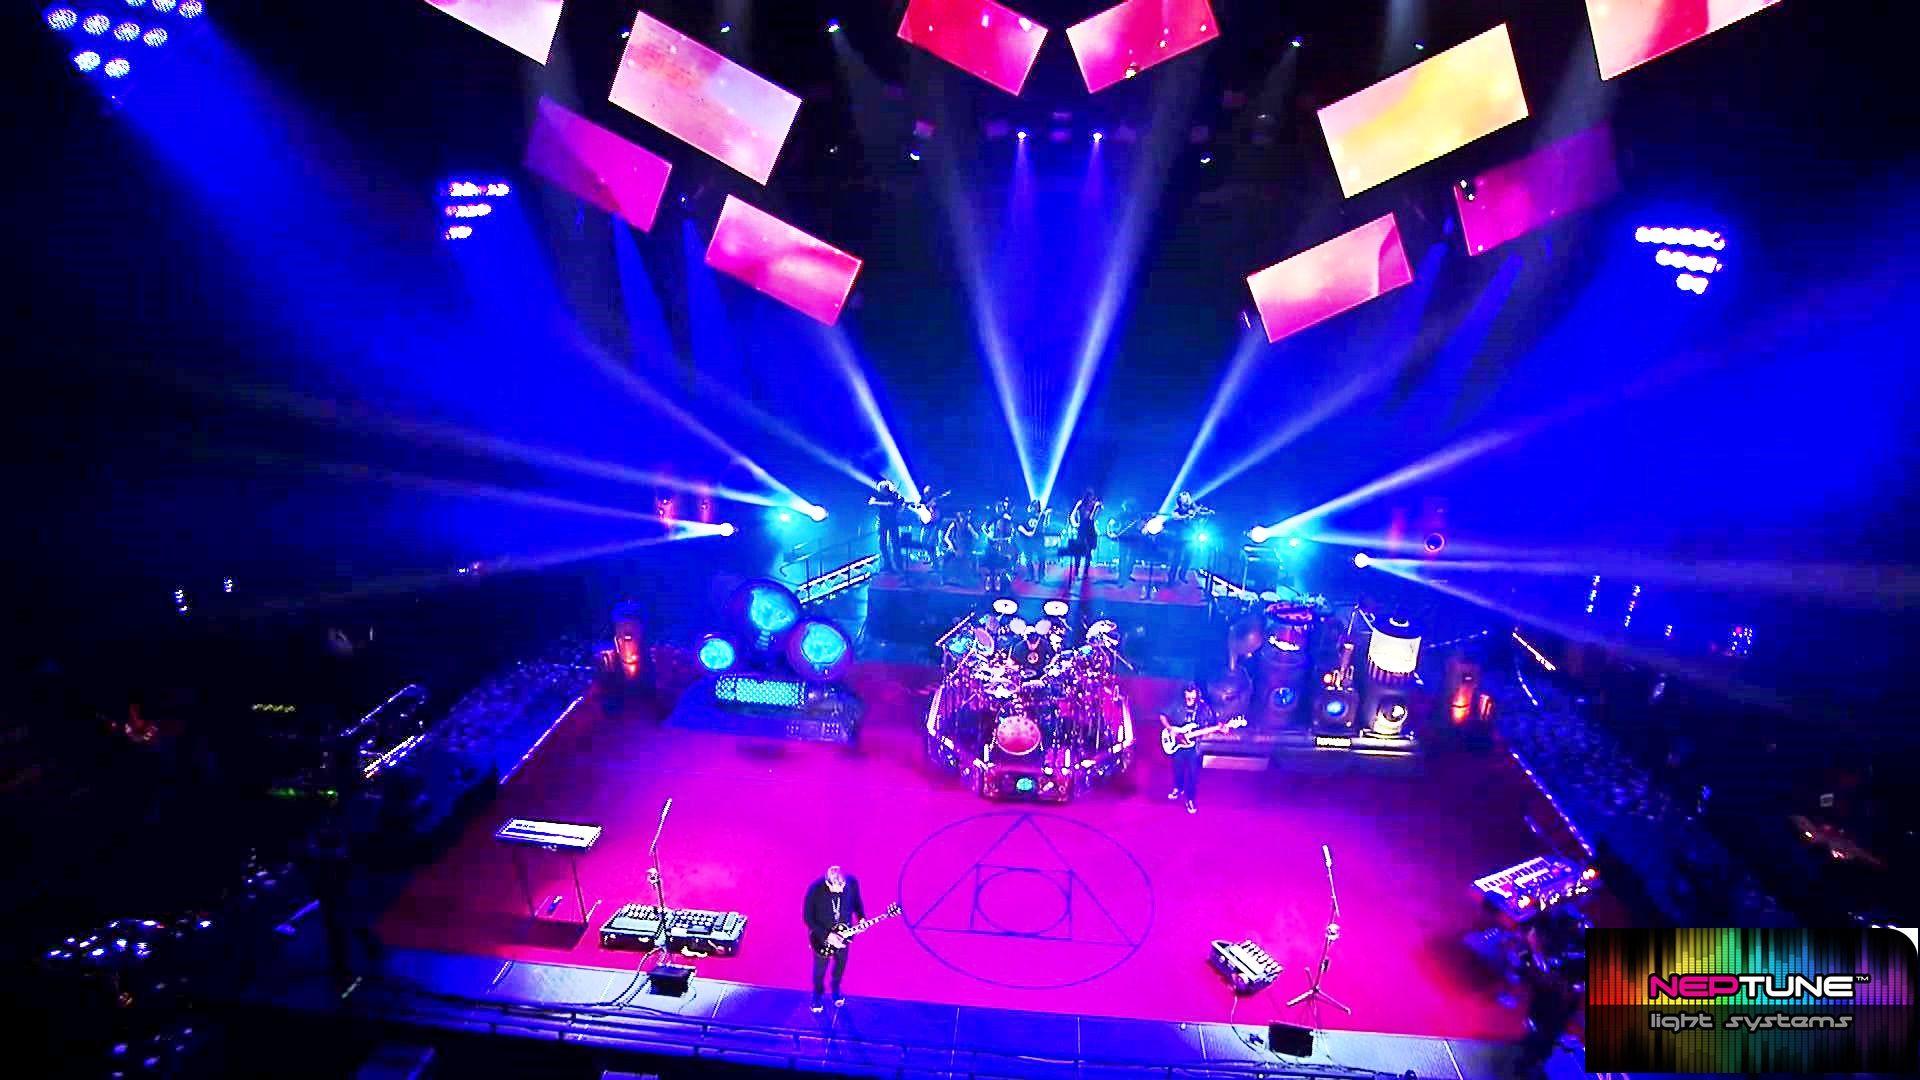 Light Up Drum Gear Including Rockstix Motion Activated Led Light Up Drumsticks Aka Firestix And Neptune Red Rockstix Clockwork Angel Rush Band Rush Music